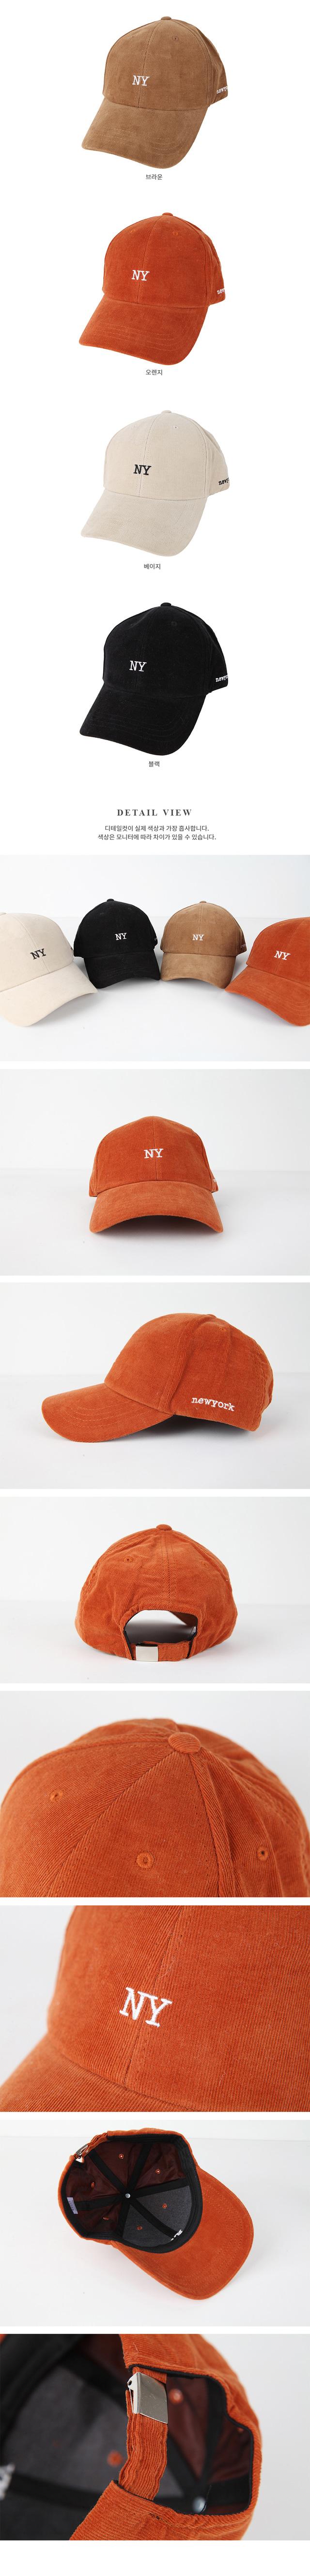 Niwai corduroy cap hat